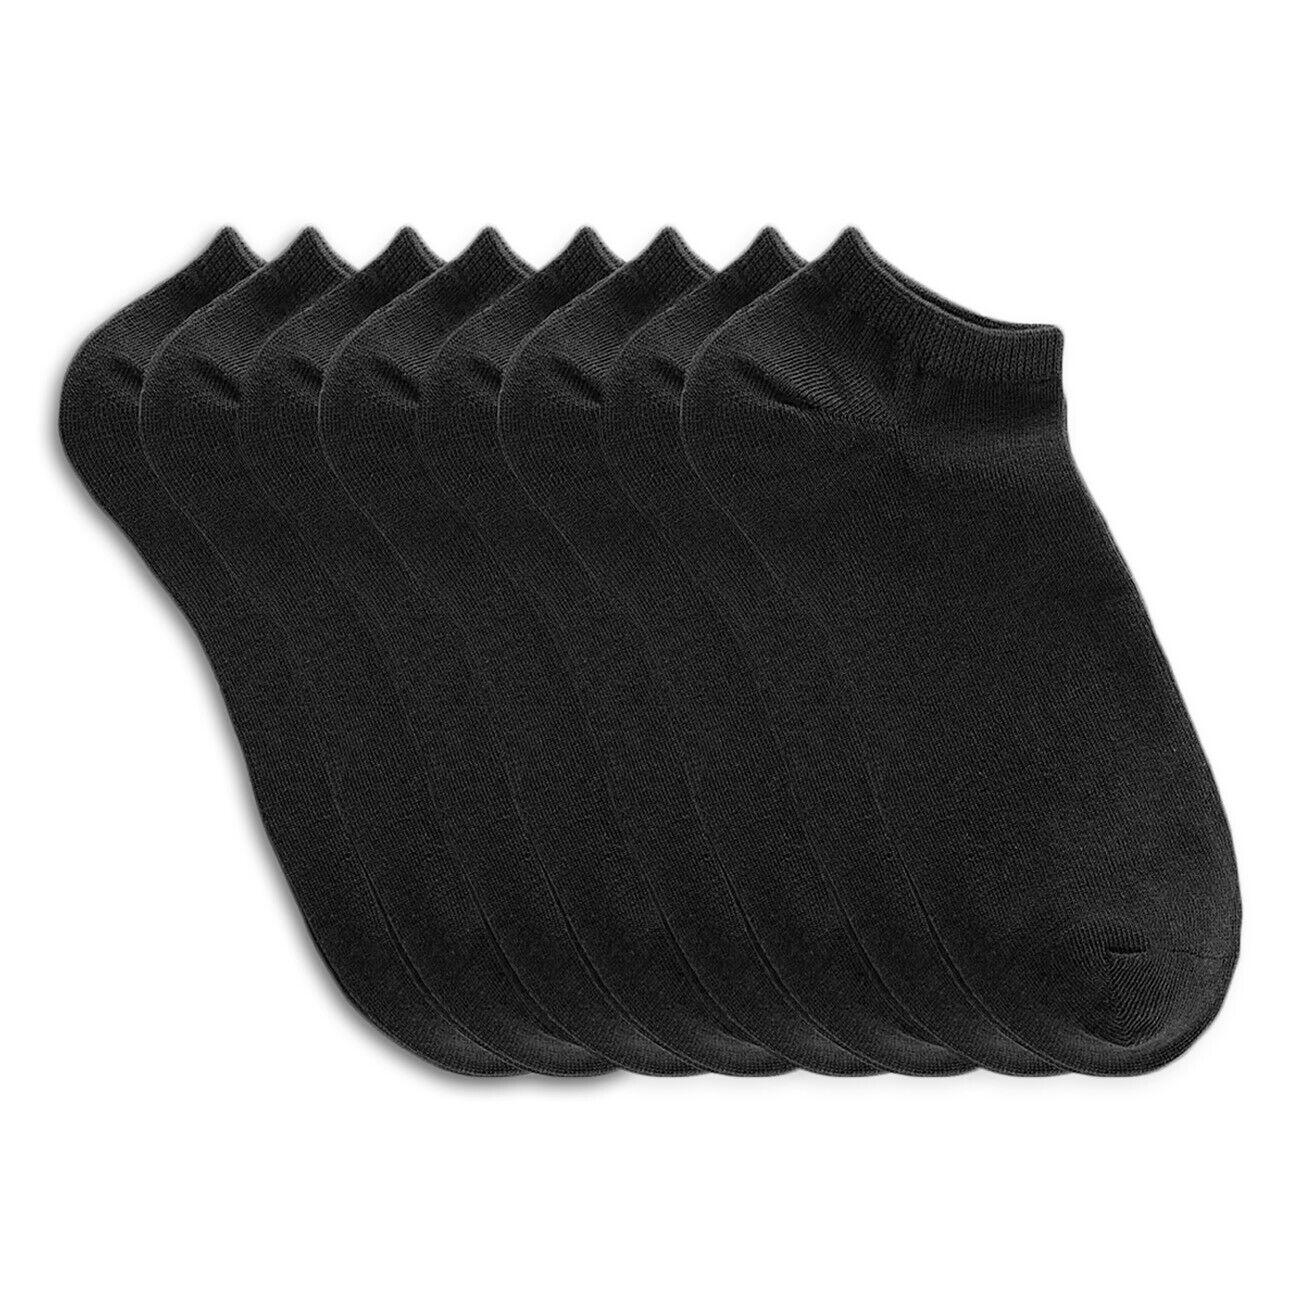 210 Pairs Wholesale Lot Everlast Socks Mens No Show Athletic Sock Size 1013